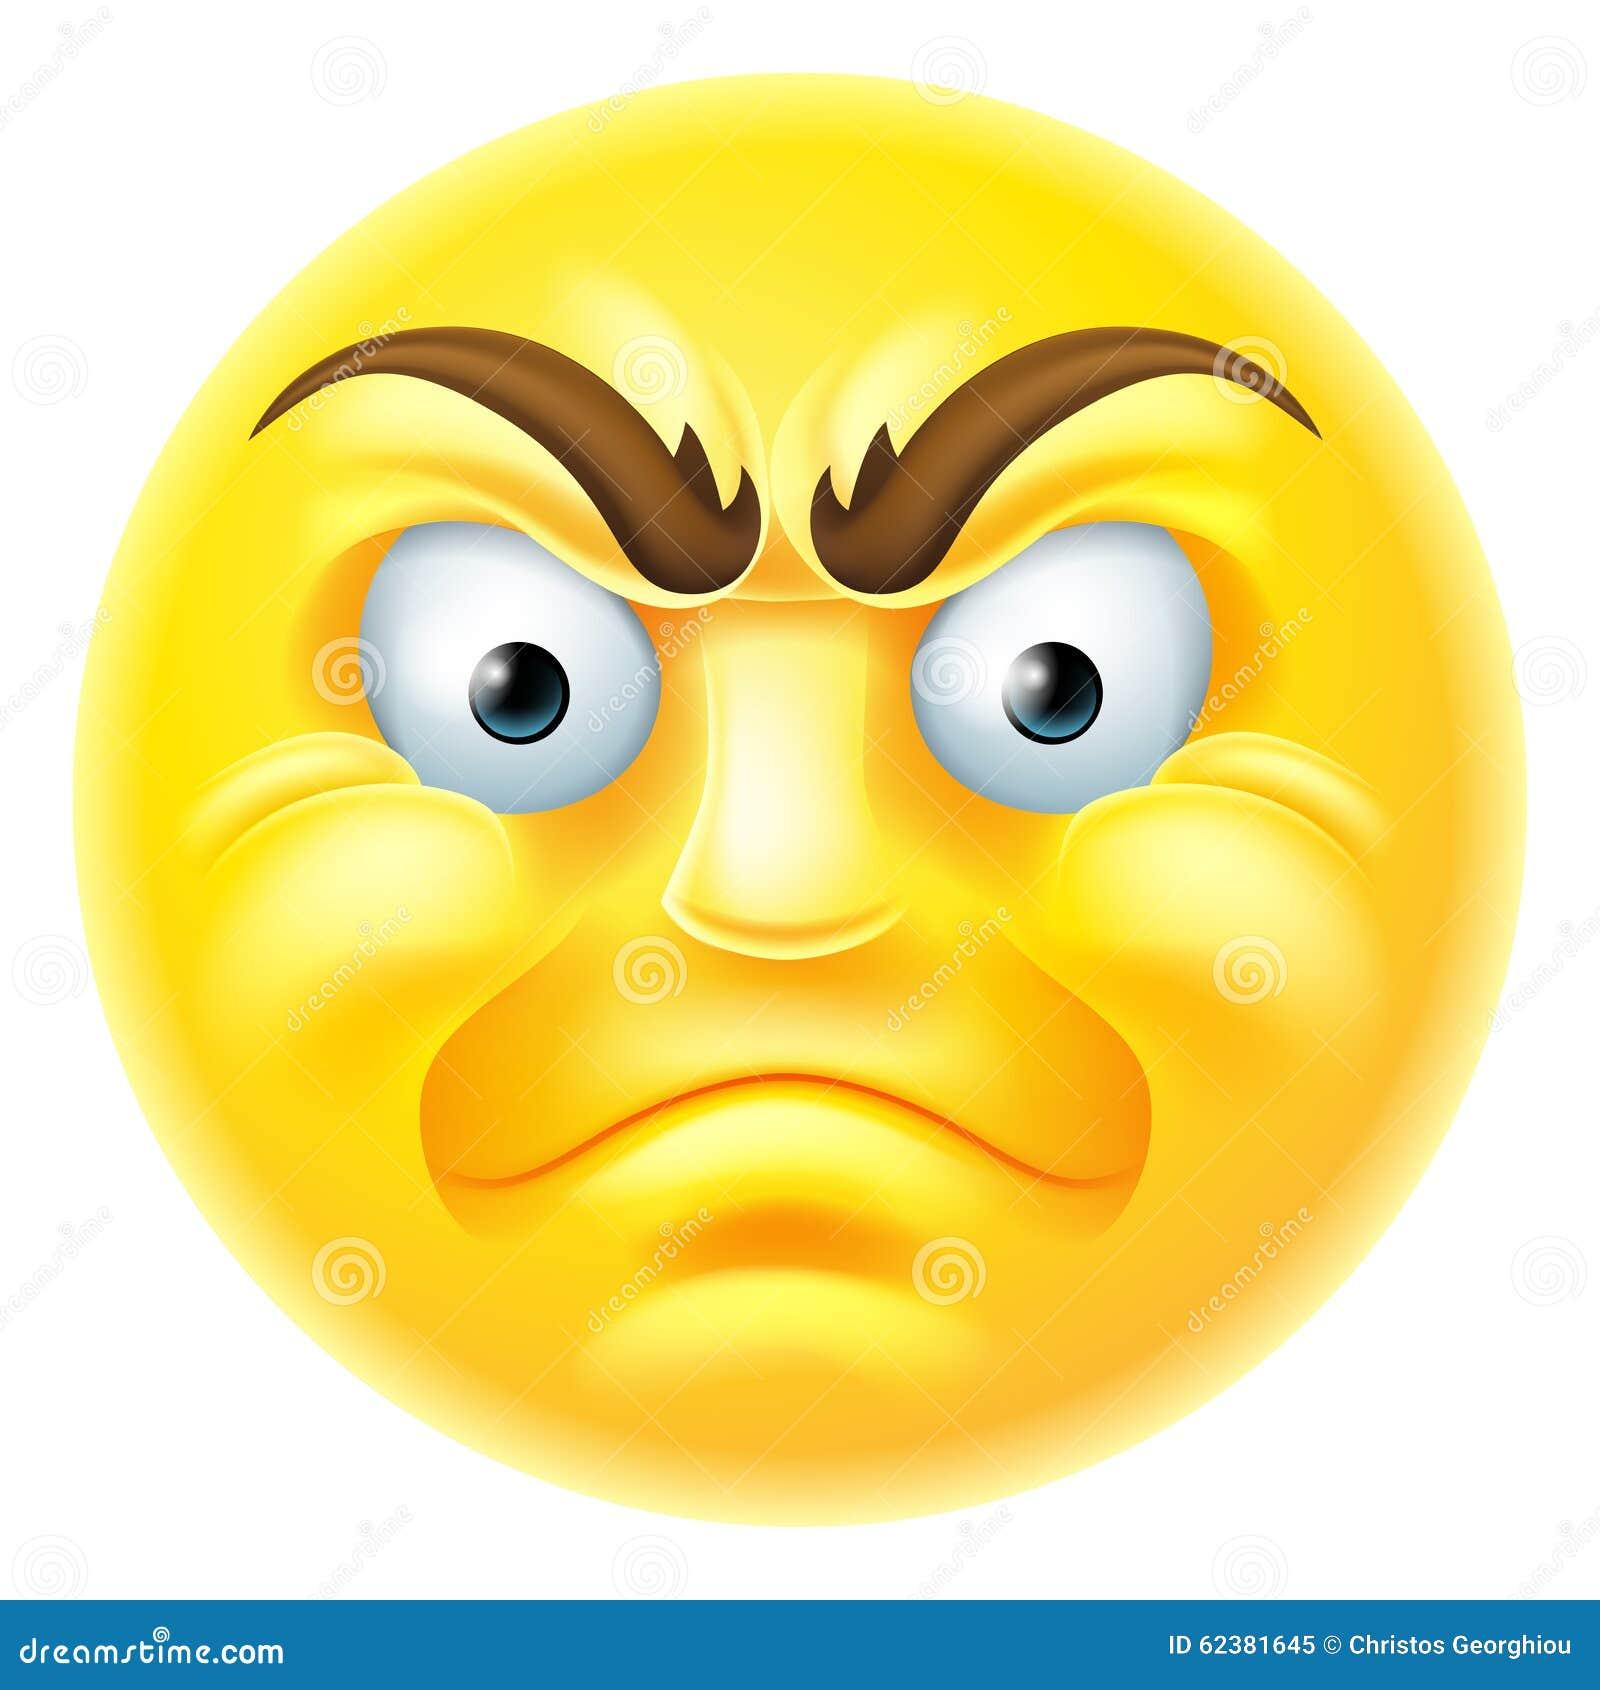 Angry Emoji Emoticon Cartoon Stock Vector Illustration